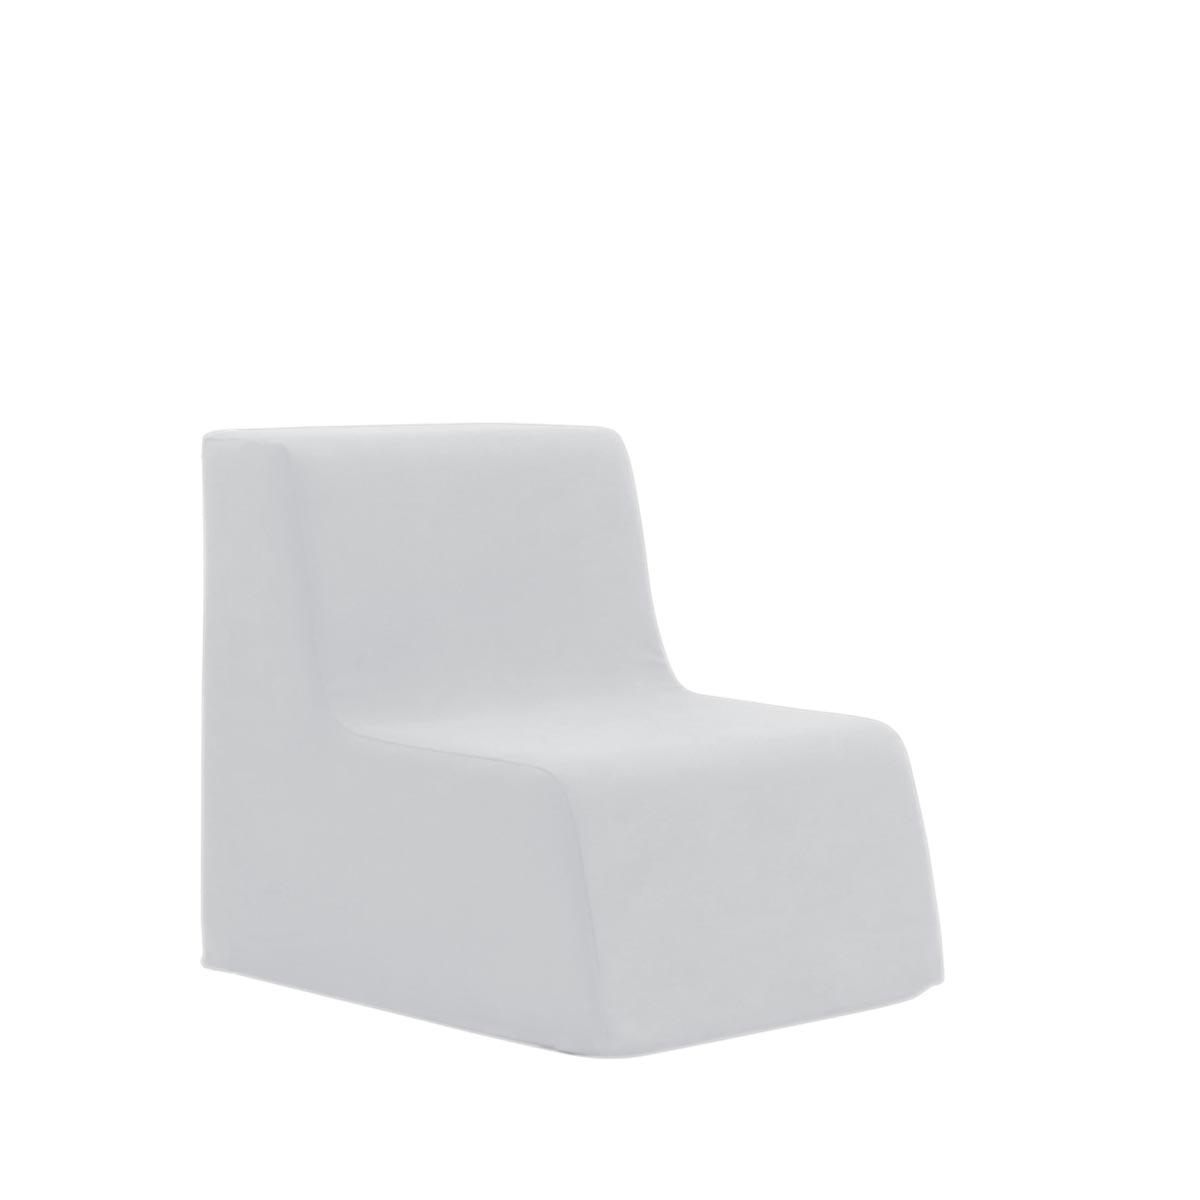 Poltroninha Muss r02 Tecido Lonita Branco 02